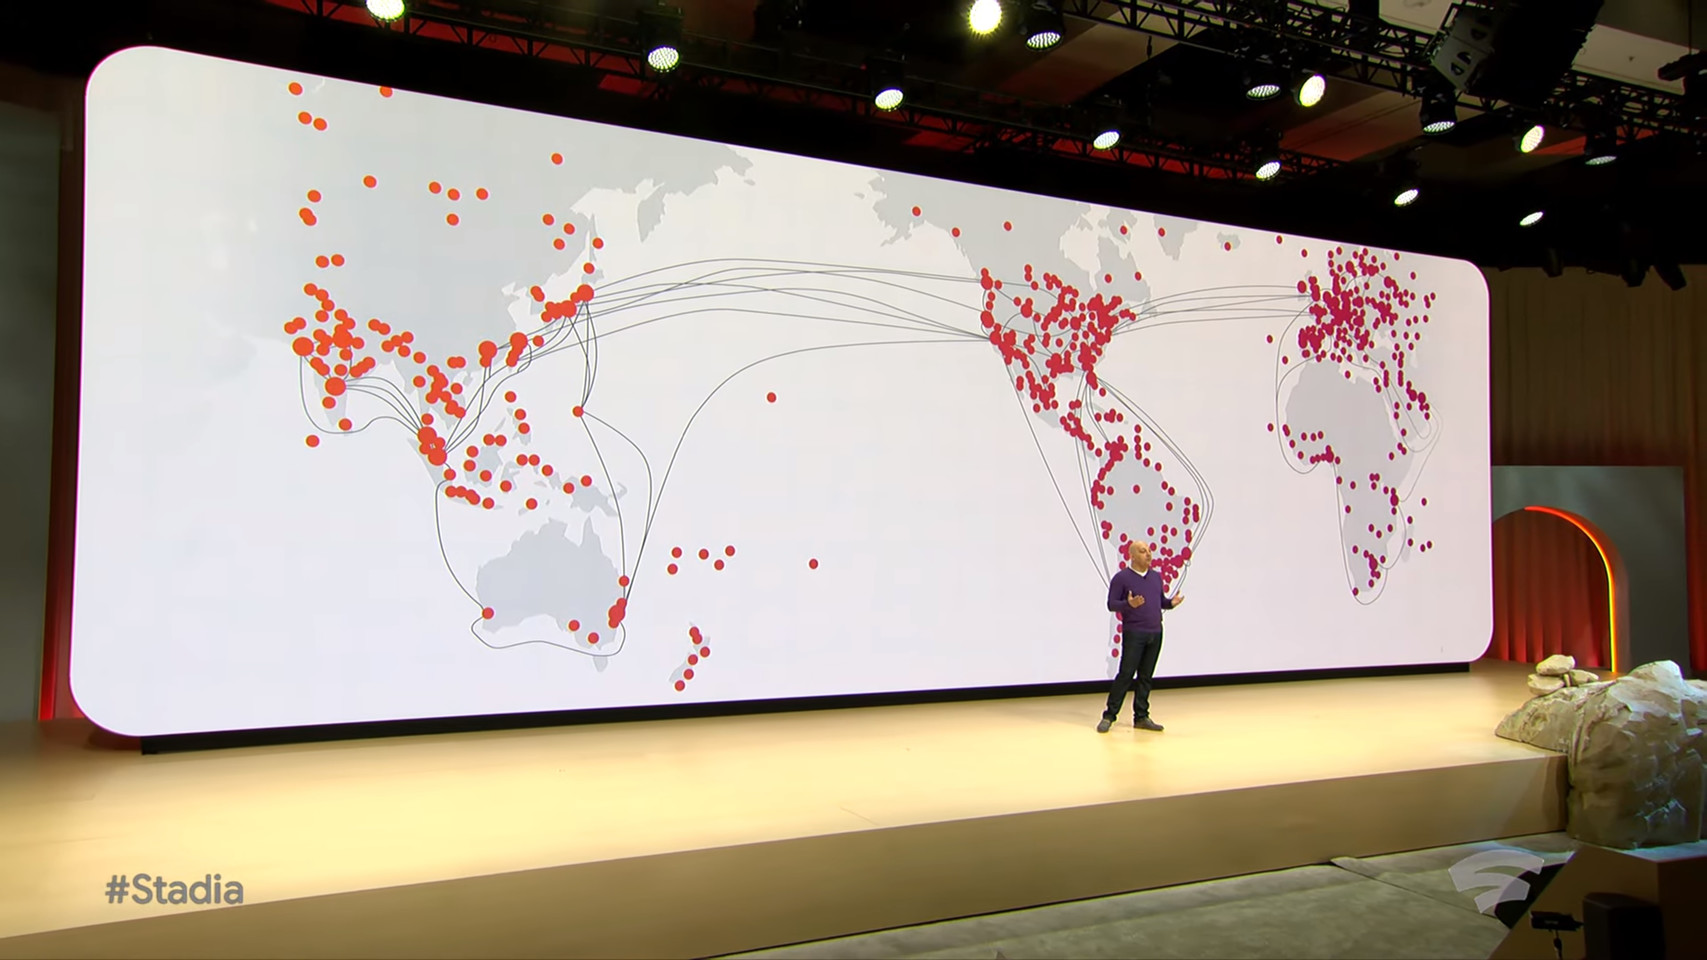 Google stadia: обзор сервиса облачного гейминга от google